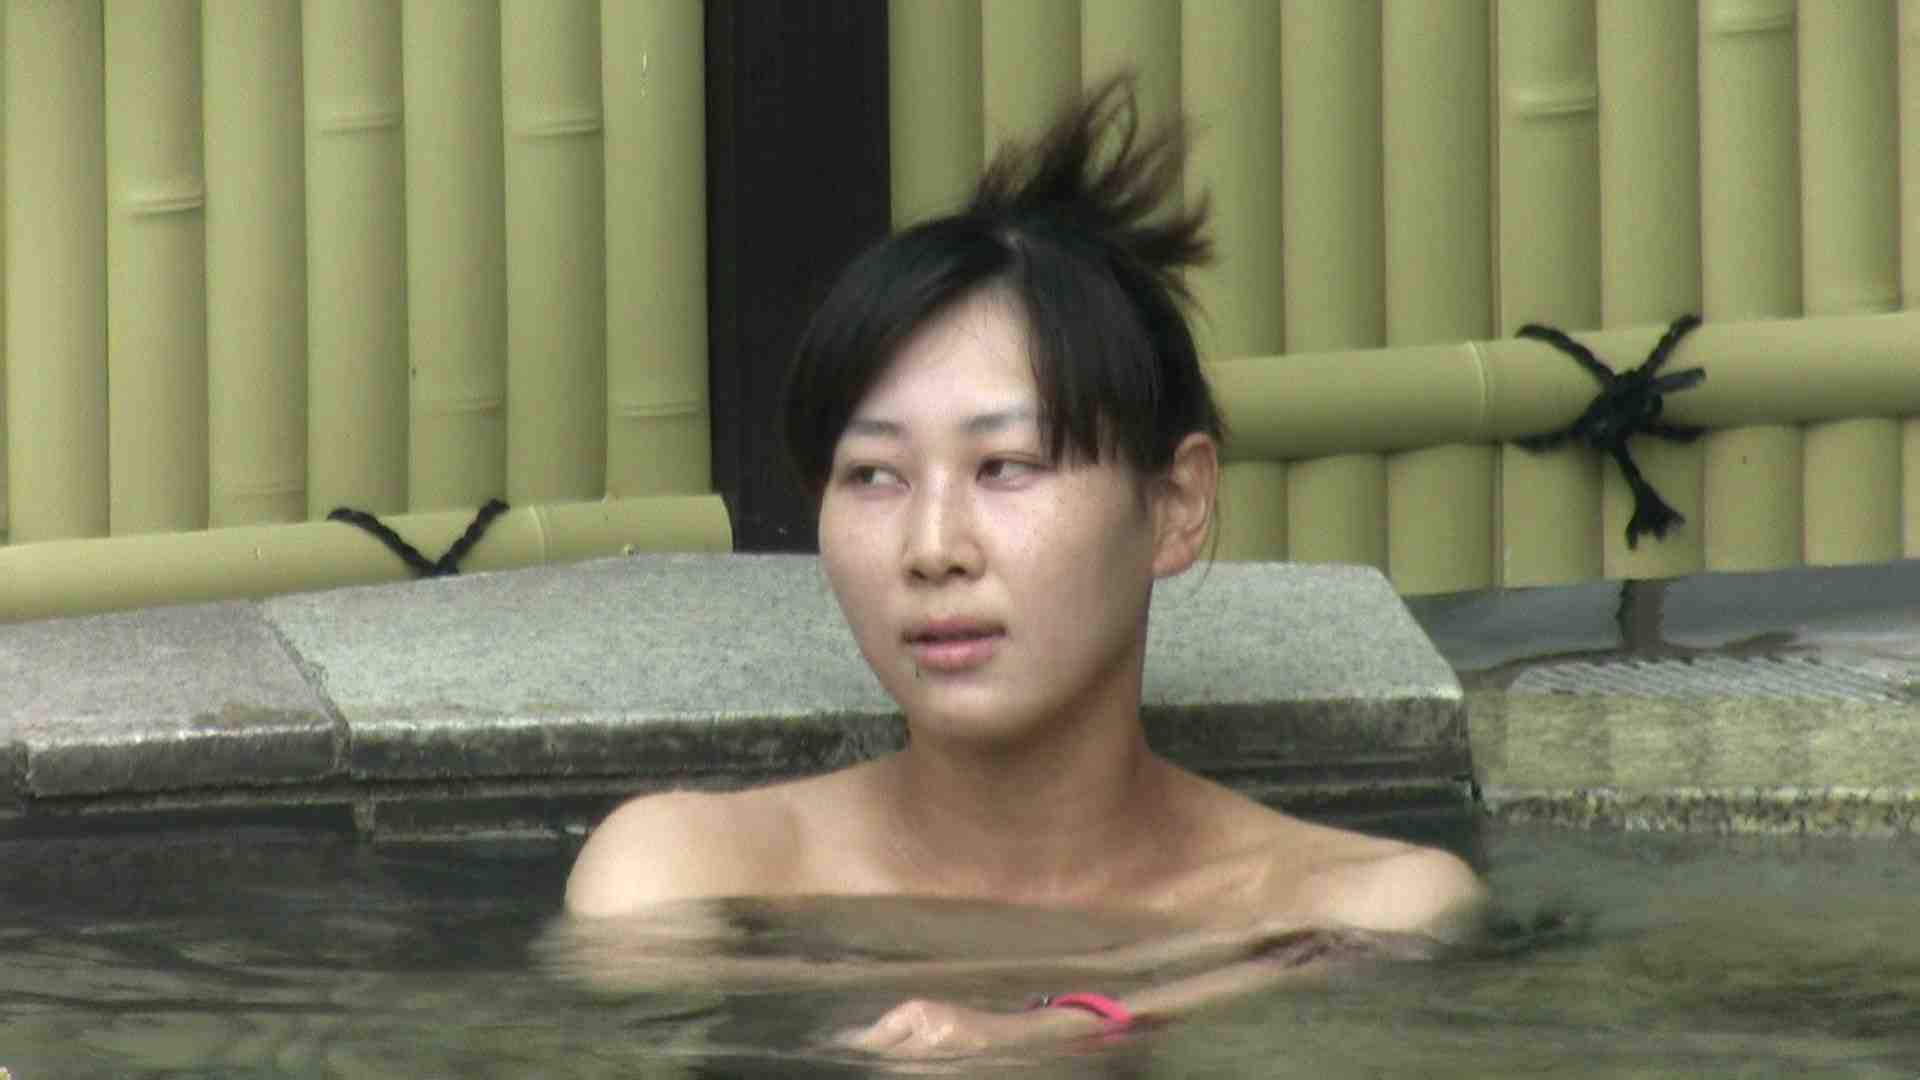 Aquaな露天風呂Vol.665 HなOL   盗撮  104pic 57